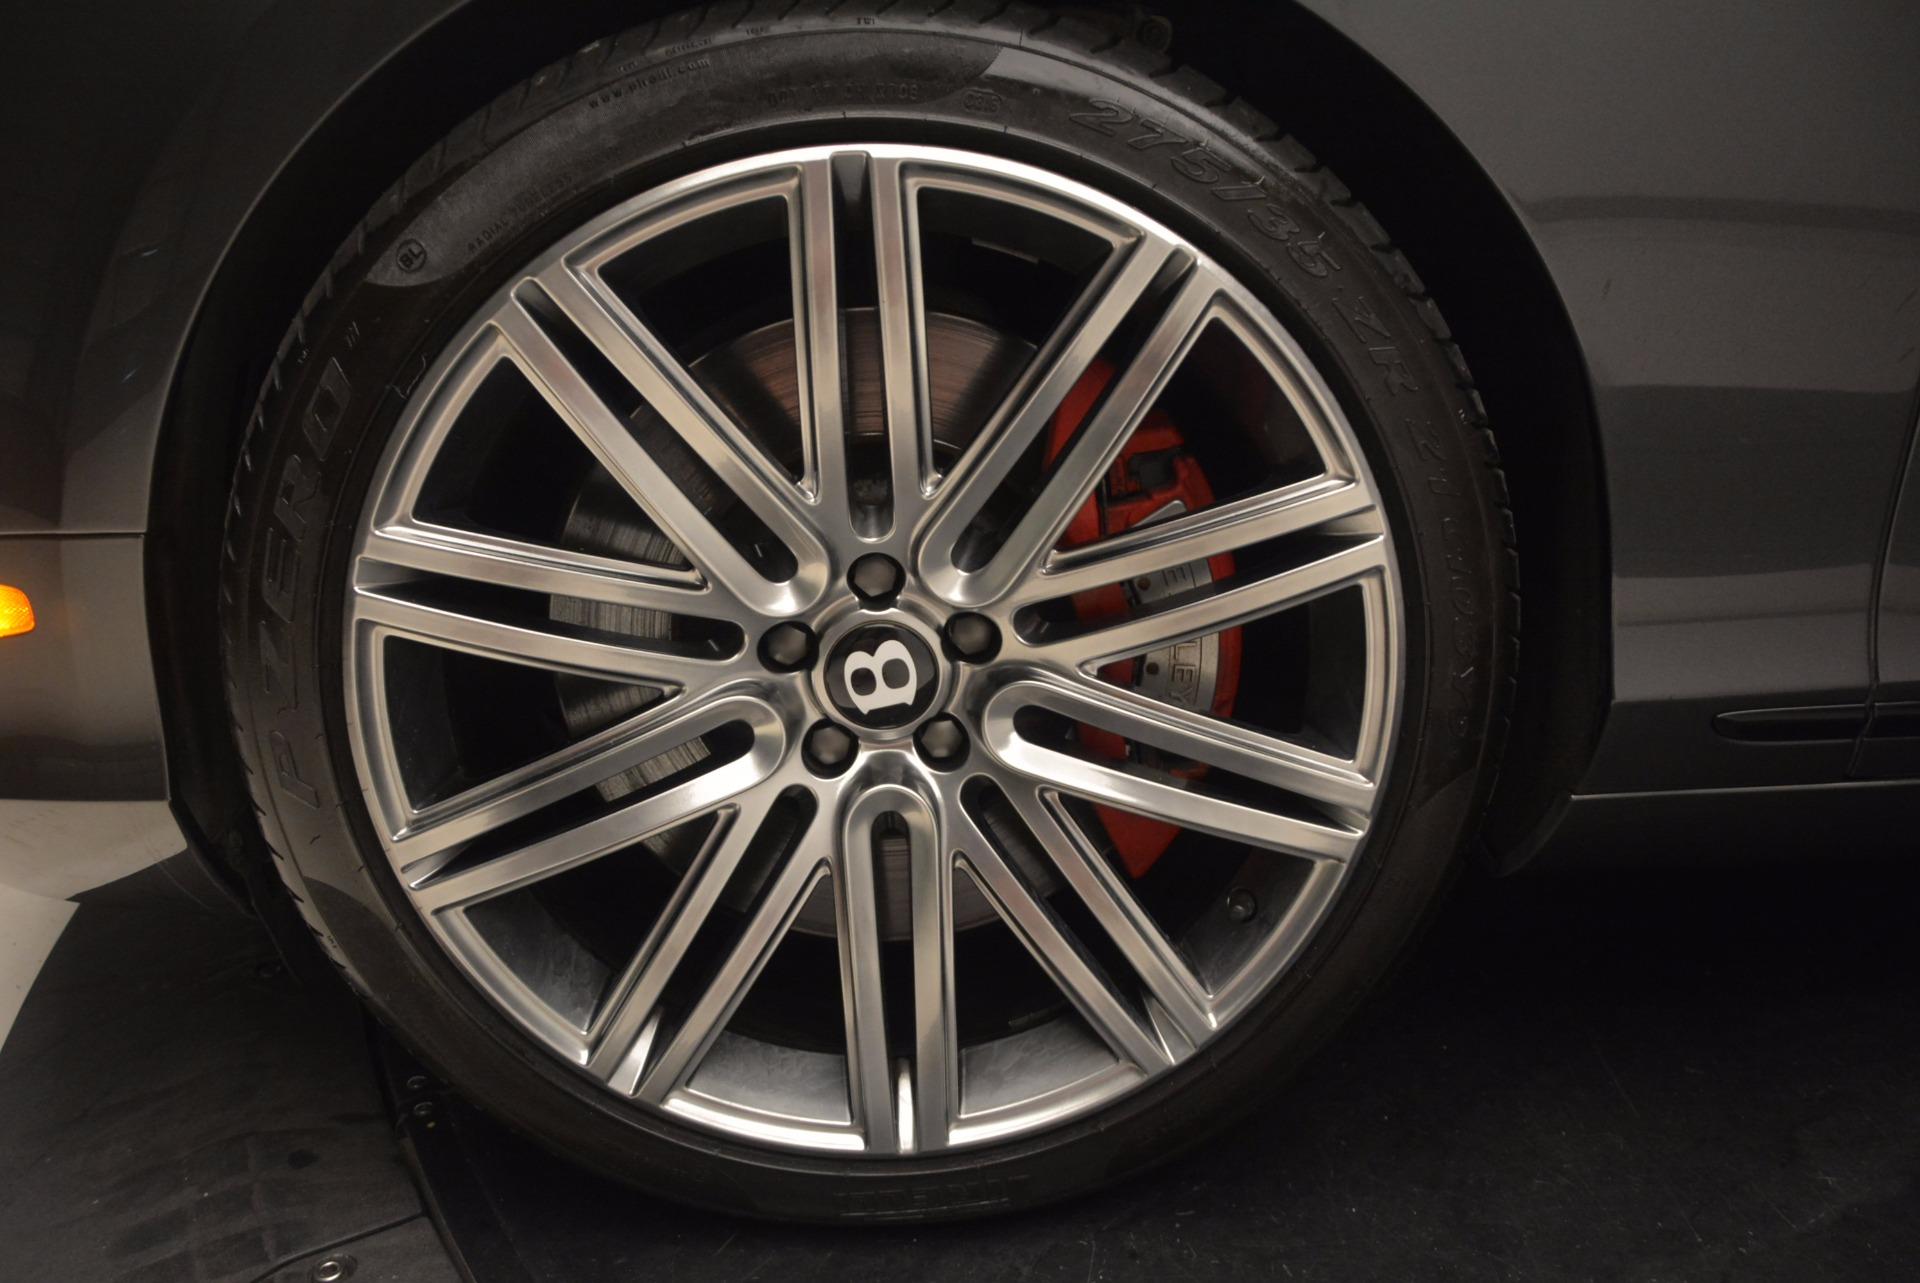 Used 2014 Bentley Continental GT Speed For Sale In Westport, CT 1473_p16